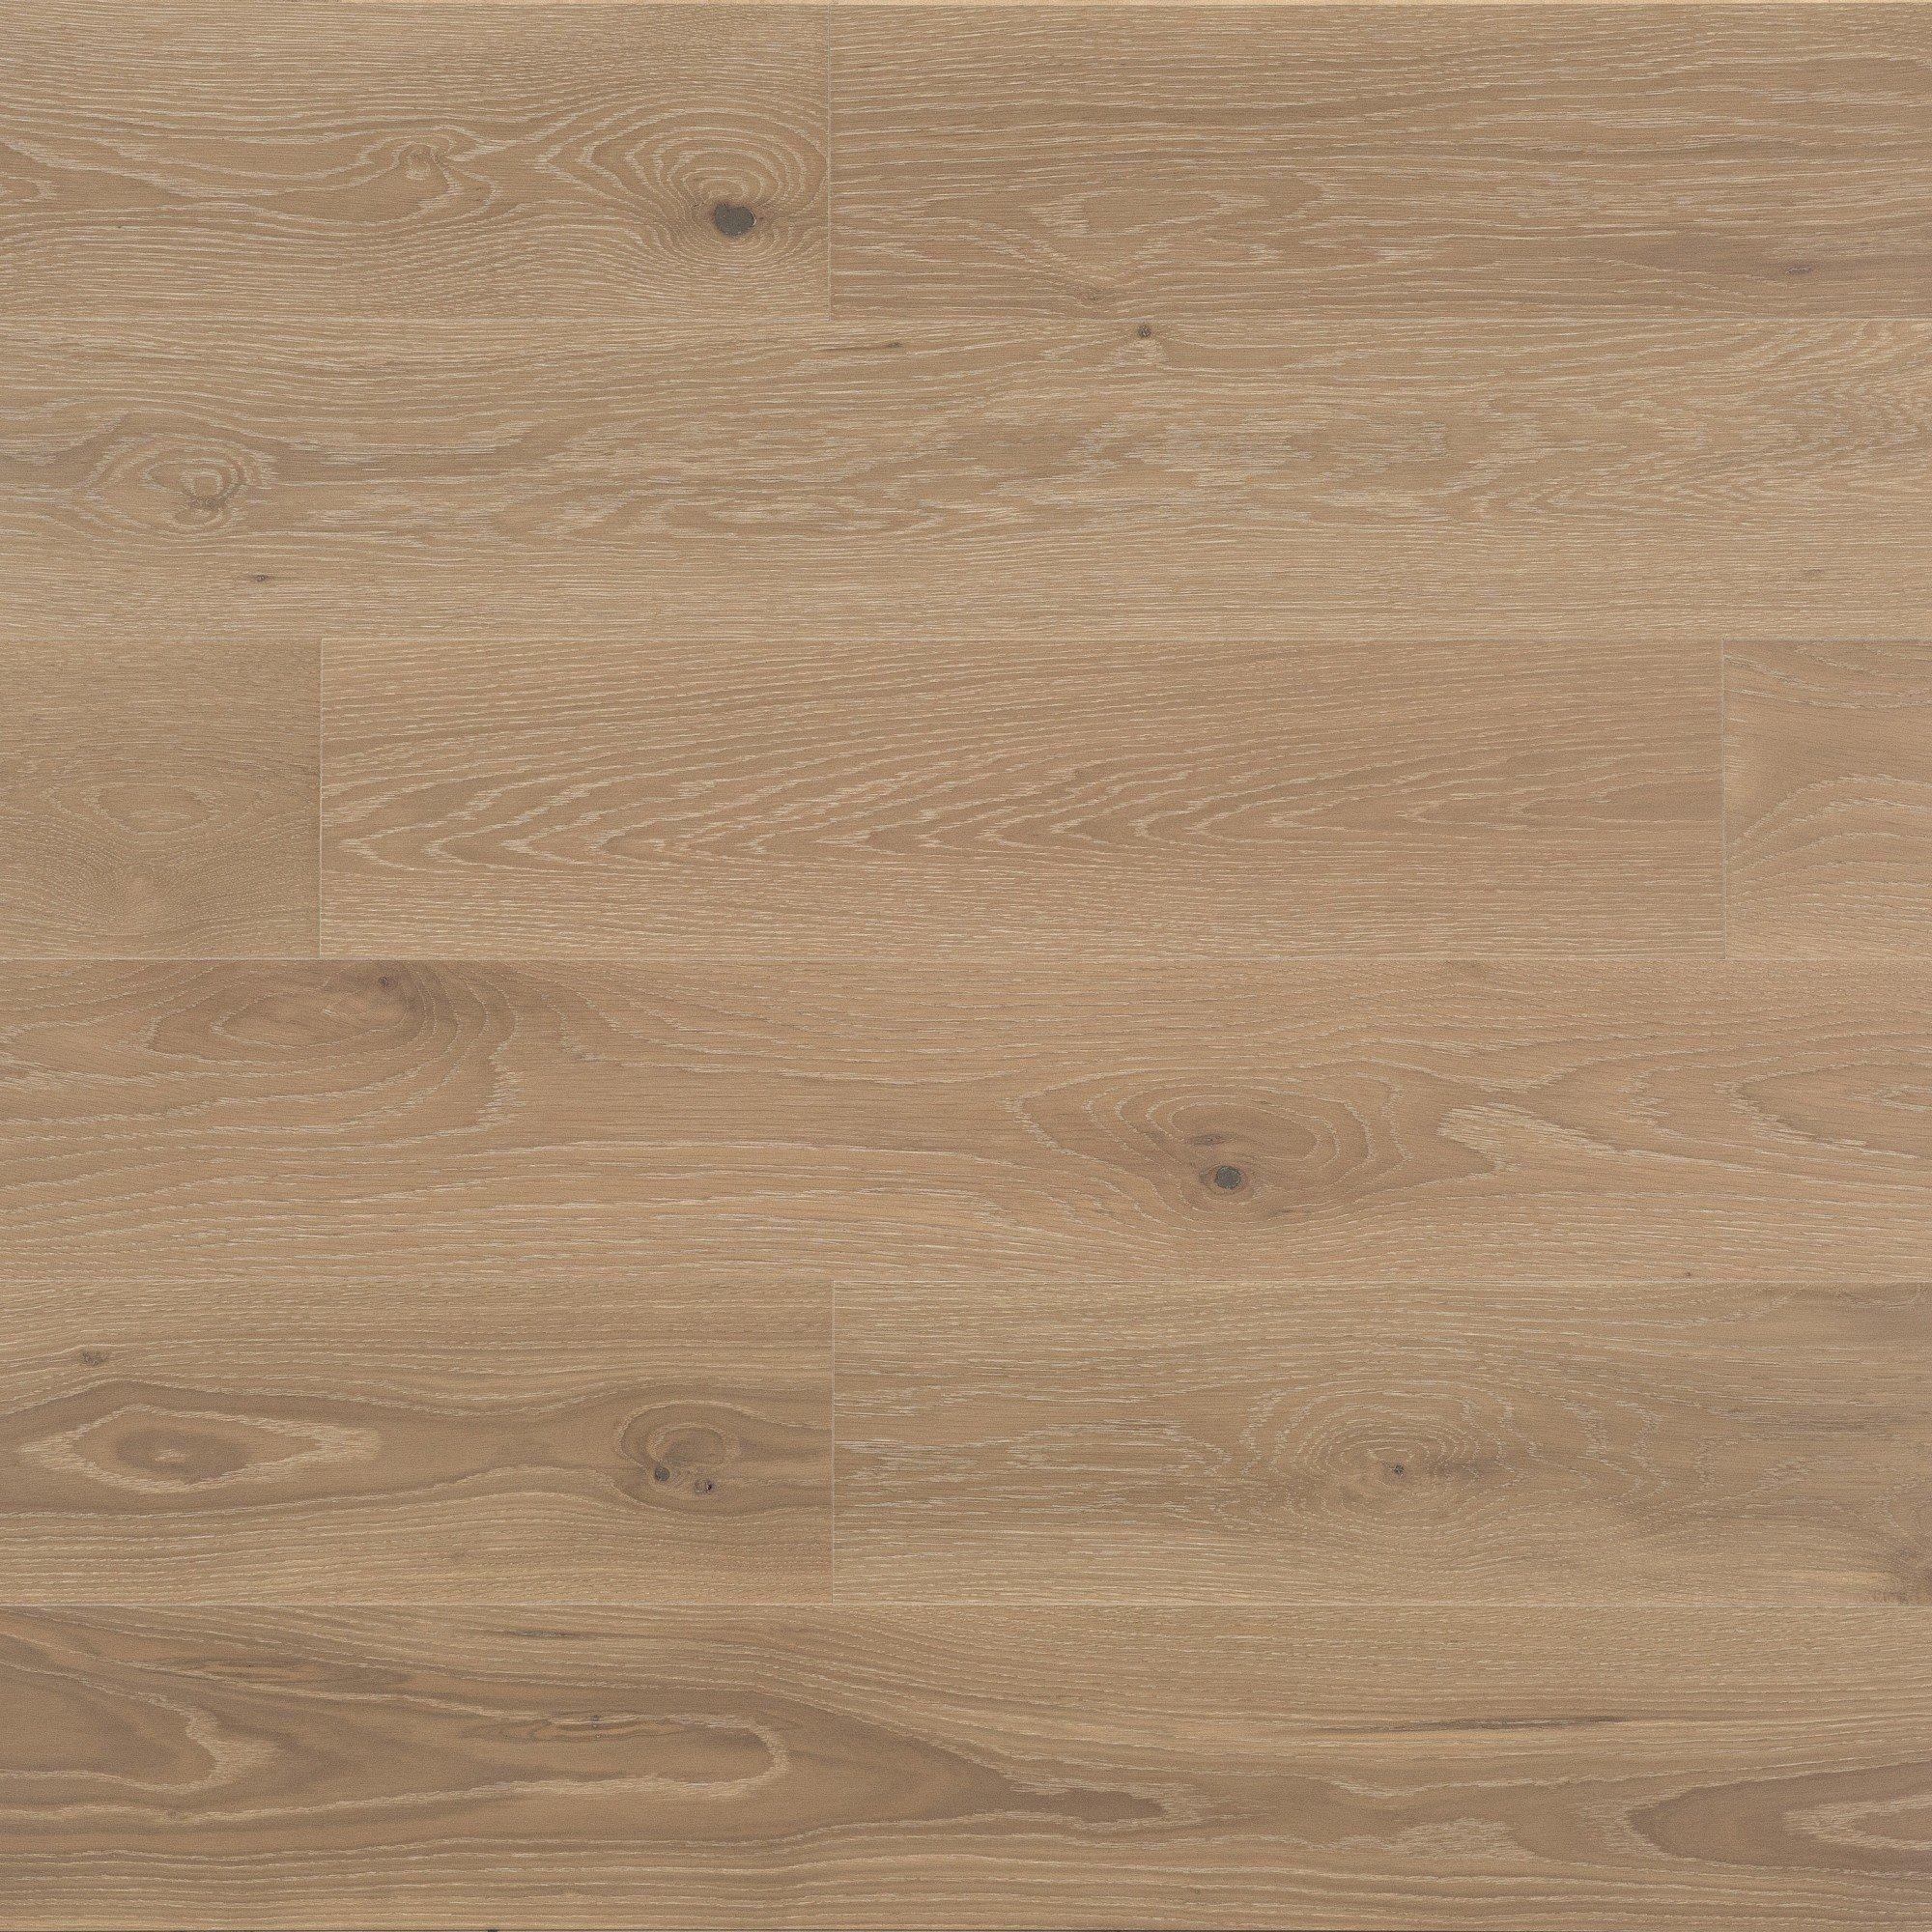 White Oak Hula Hoop Character Brushed - Floor image